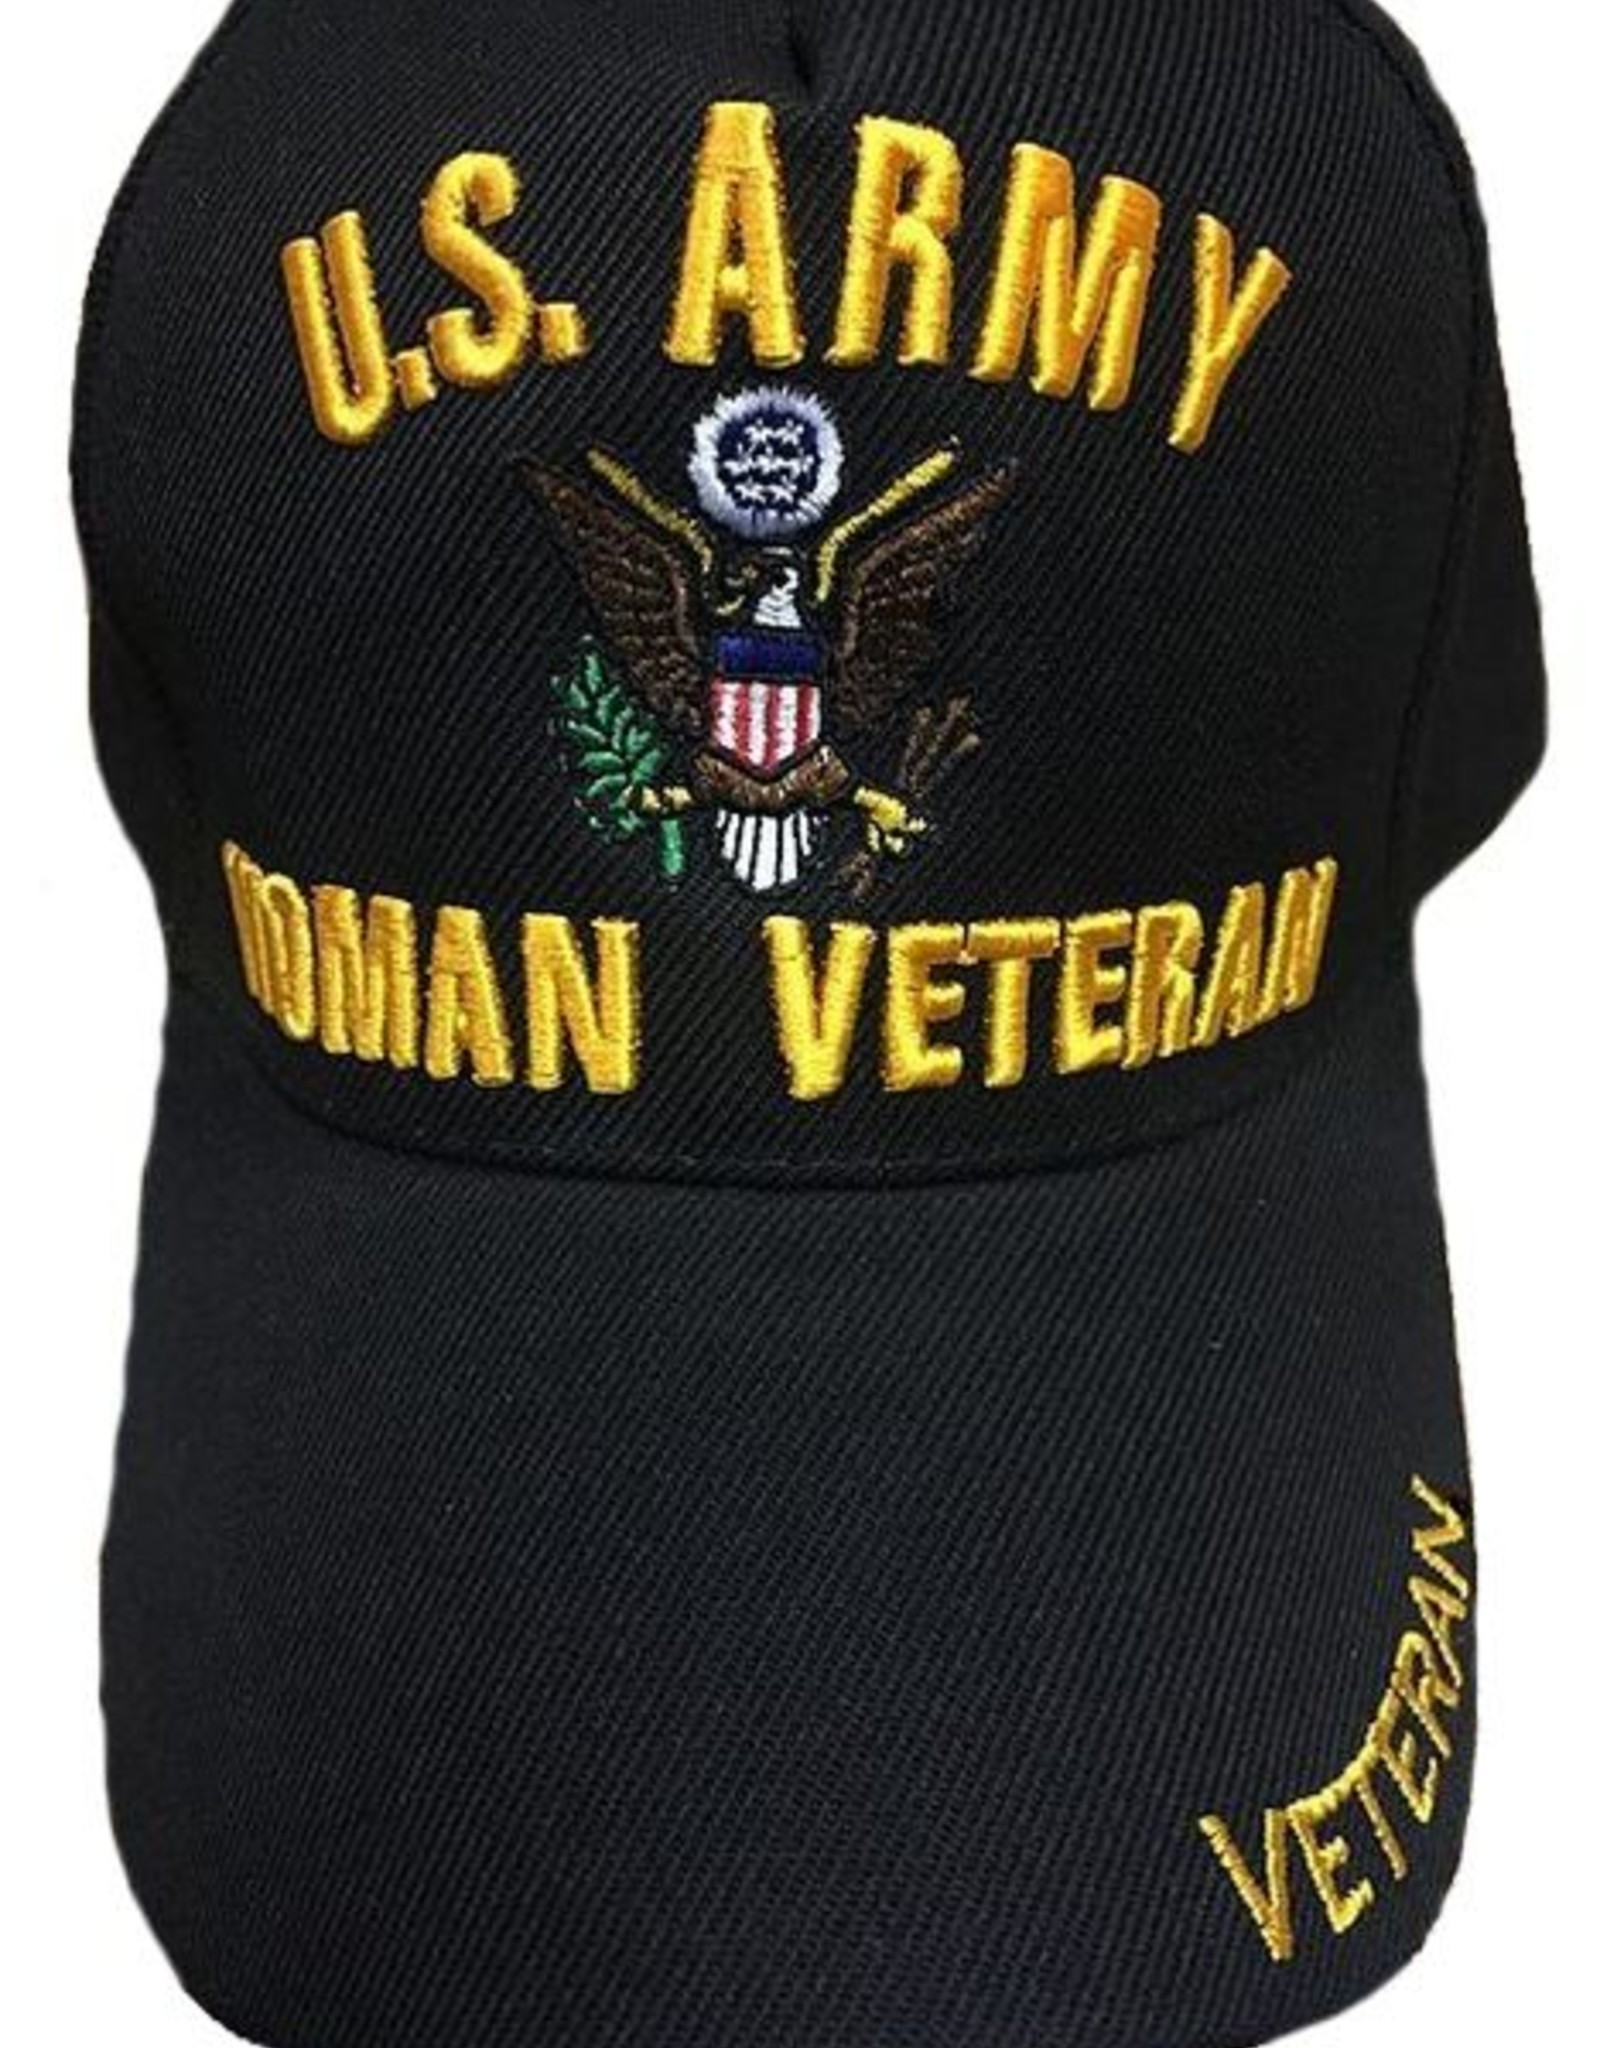 MidMil Army Woman Veteran Hat Black